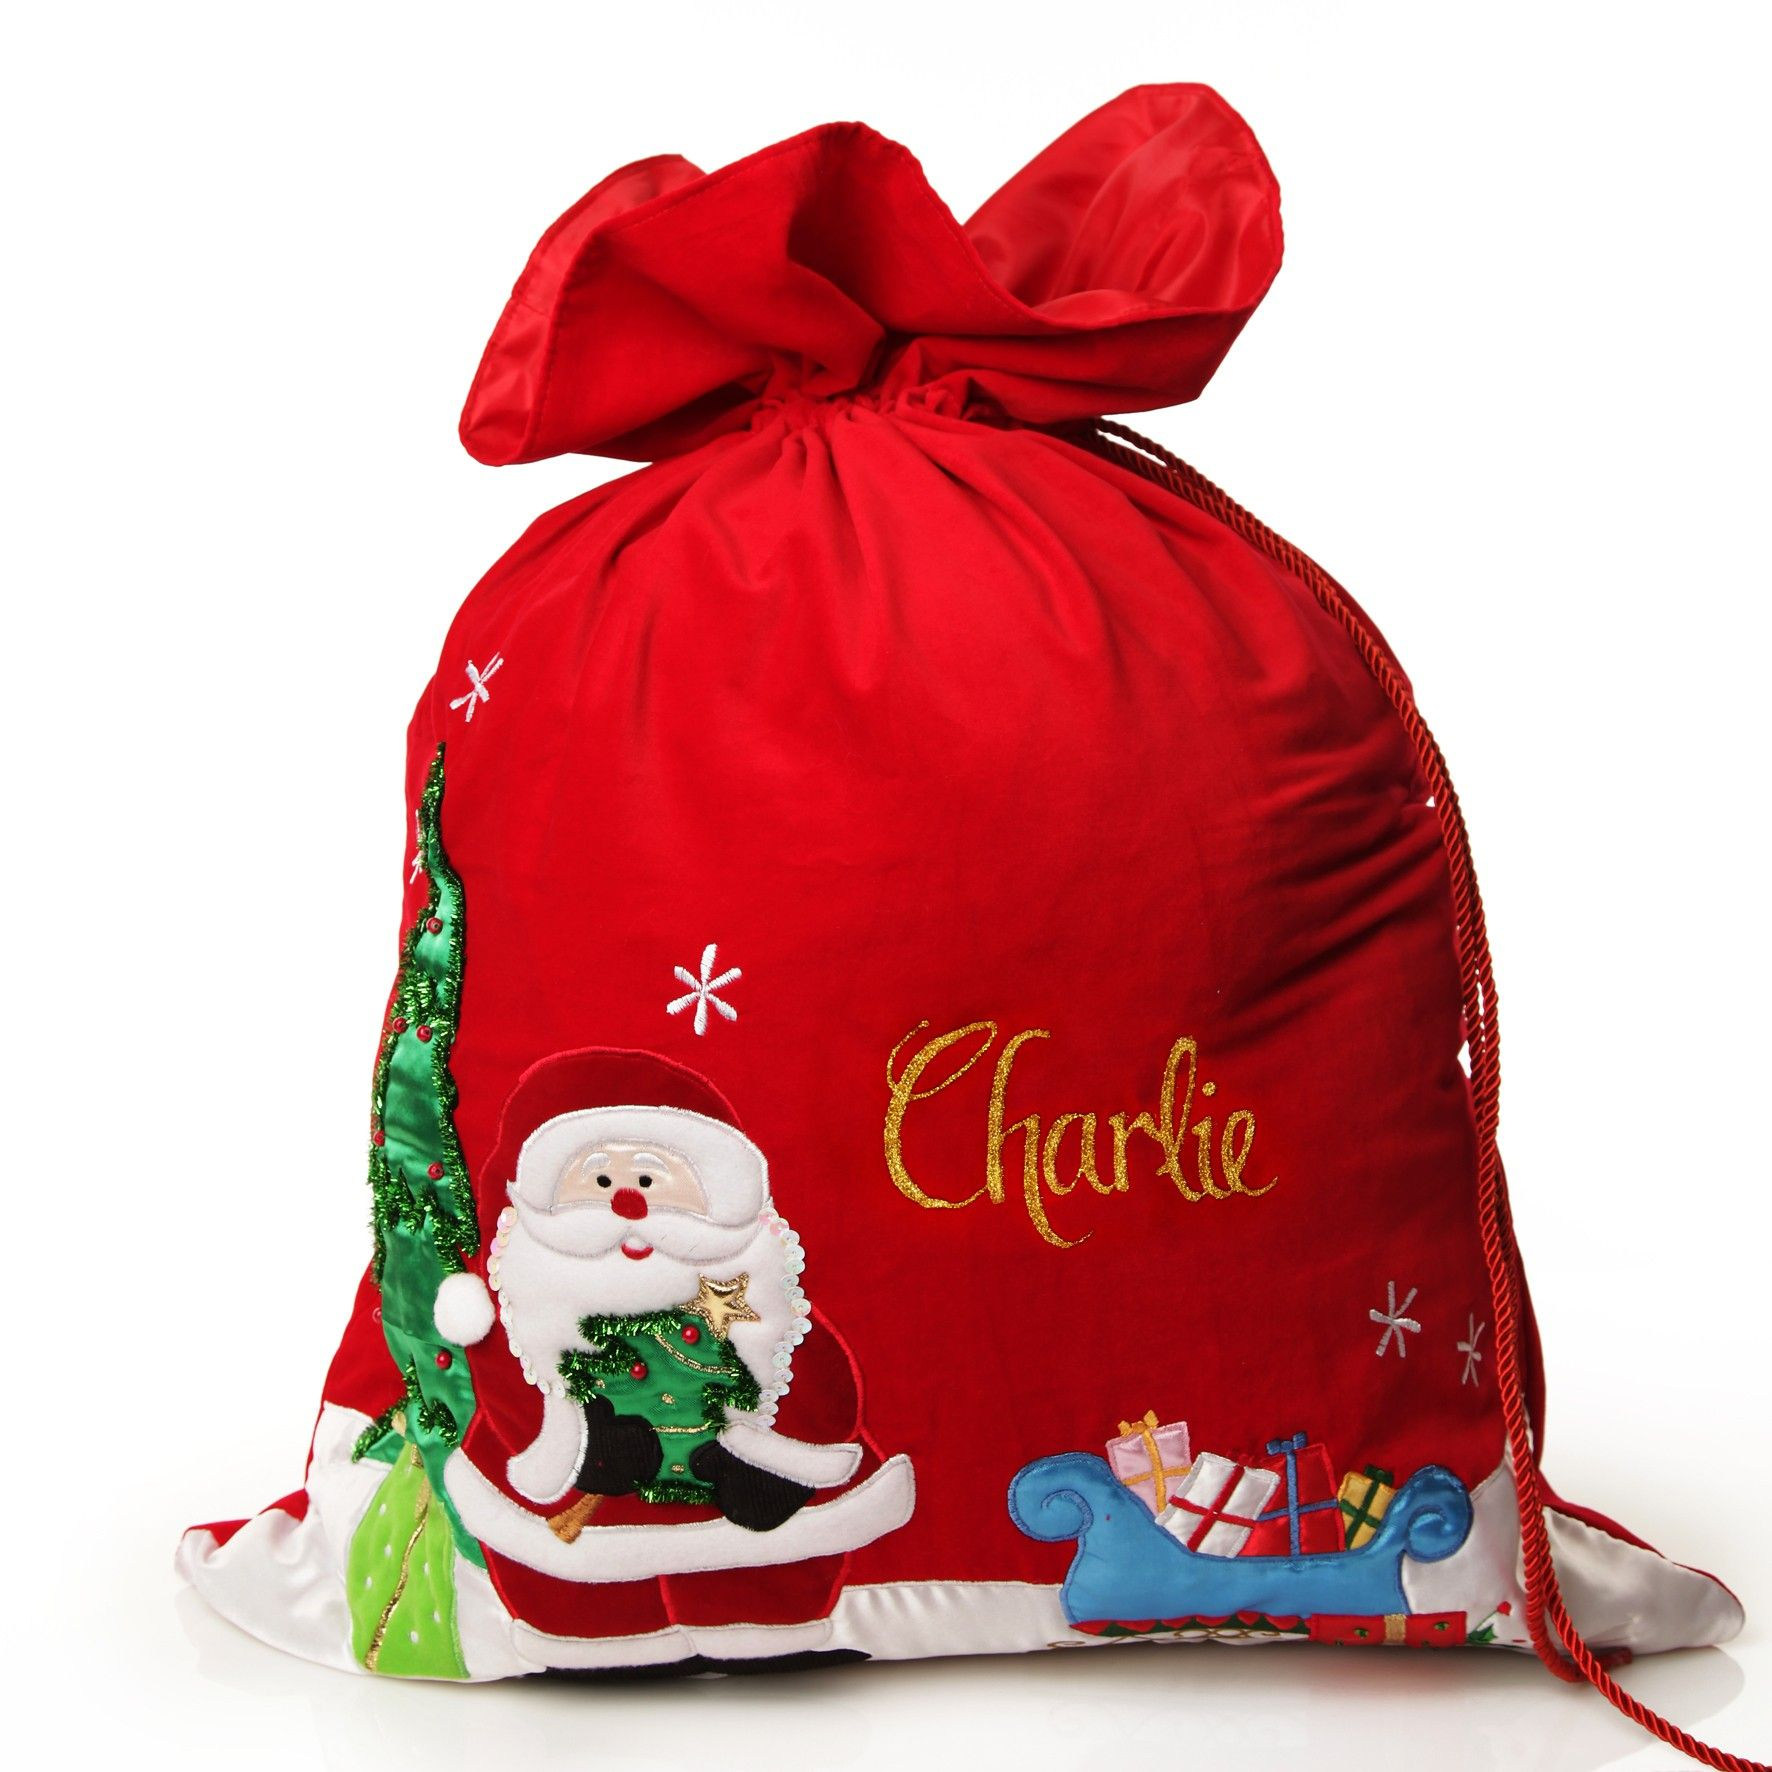 Gift xmas stocking LARGE EMBROIDERED Personalised Christmas Penguin Sack Bag